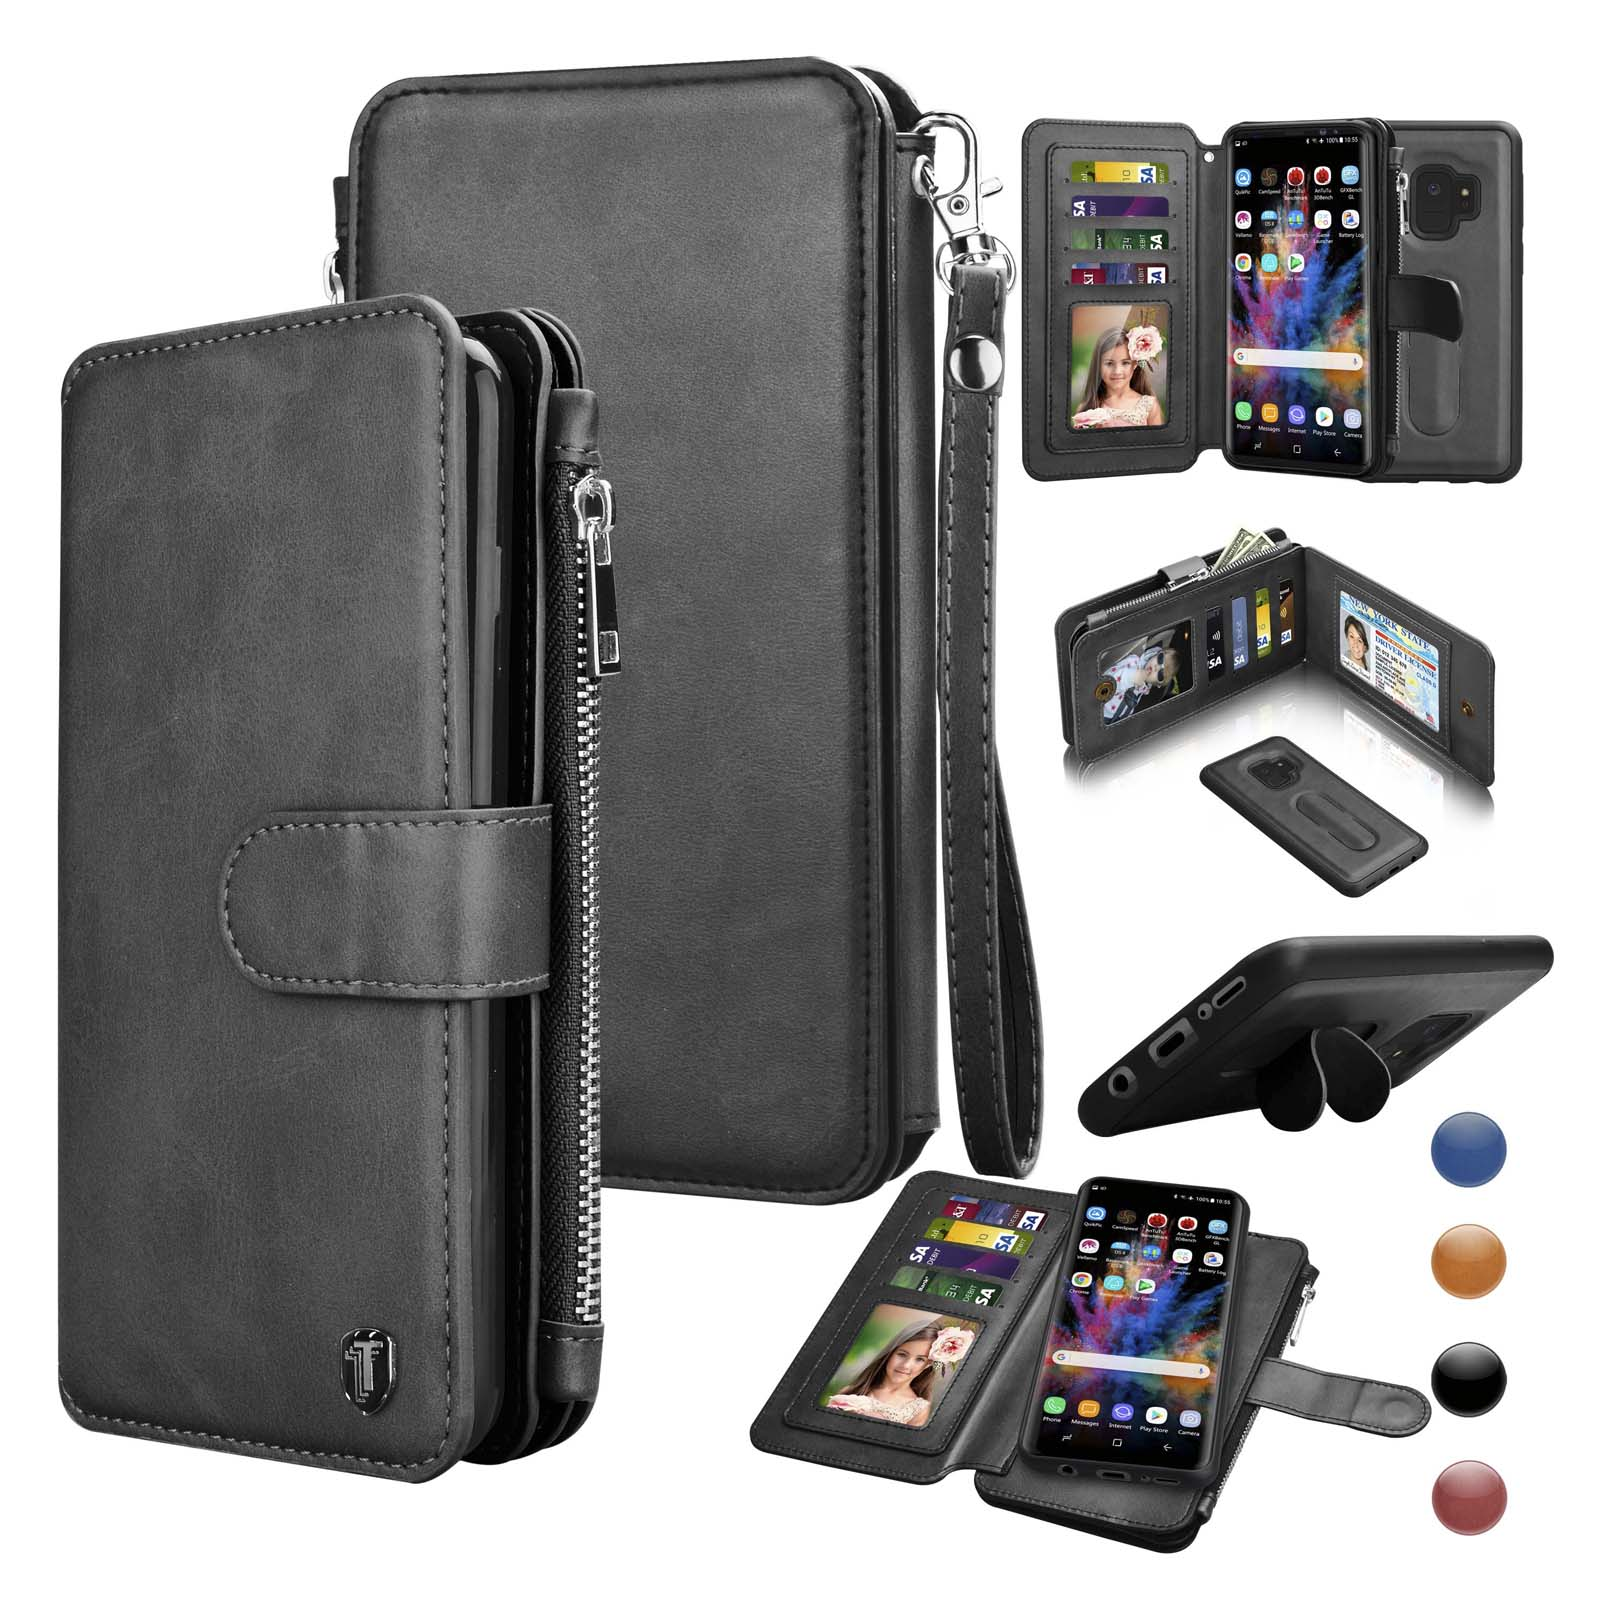 Njjex Wallet Phone Cases for Samsung Galaxy S9 / S9 Plus / S10 / S10 Plus / S10E / S9+ / S10+. Leather Detachable Magnetic Case Zipper Pocket 8 Card Slots Purse KickStand Cover Wrist Strap Gift Box